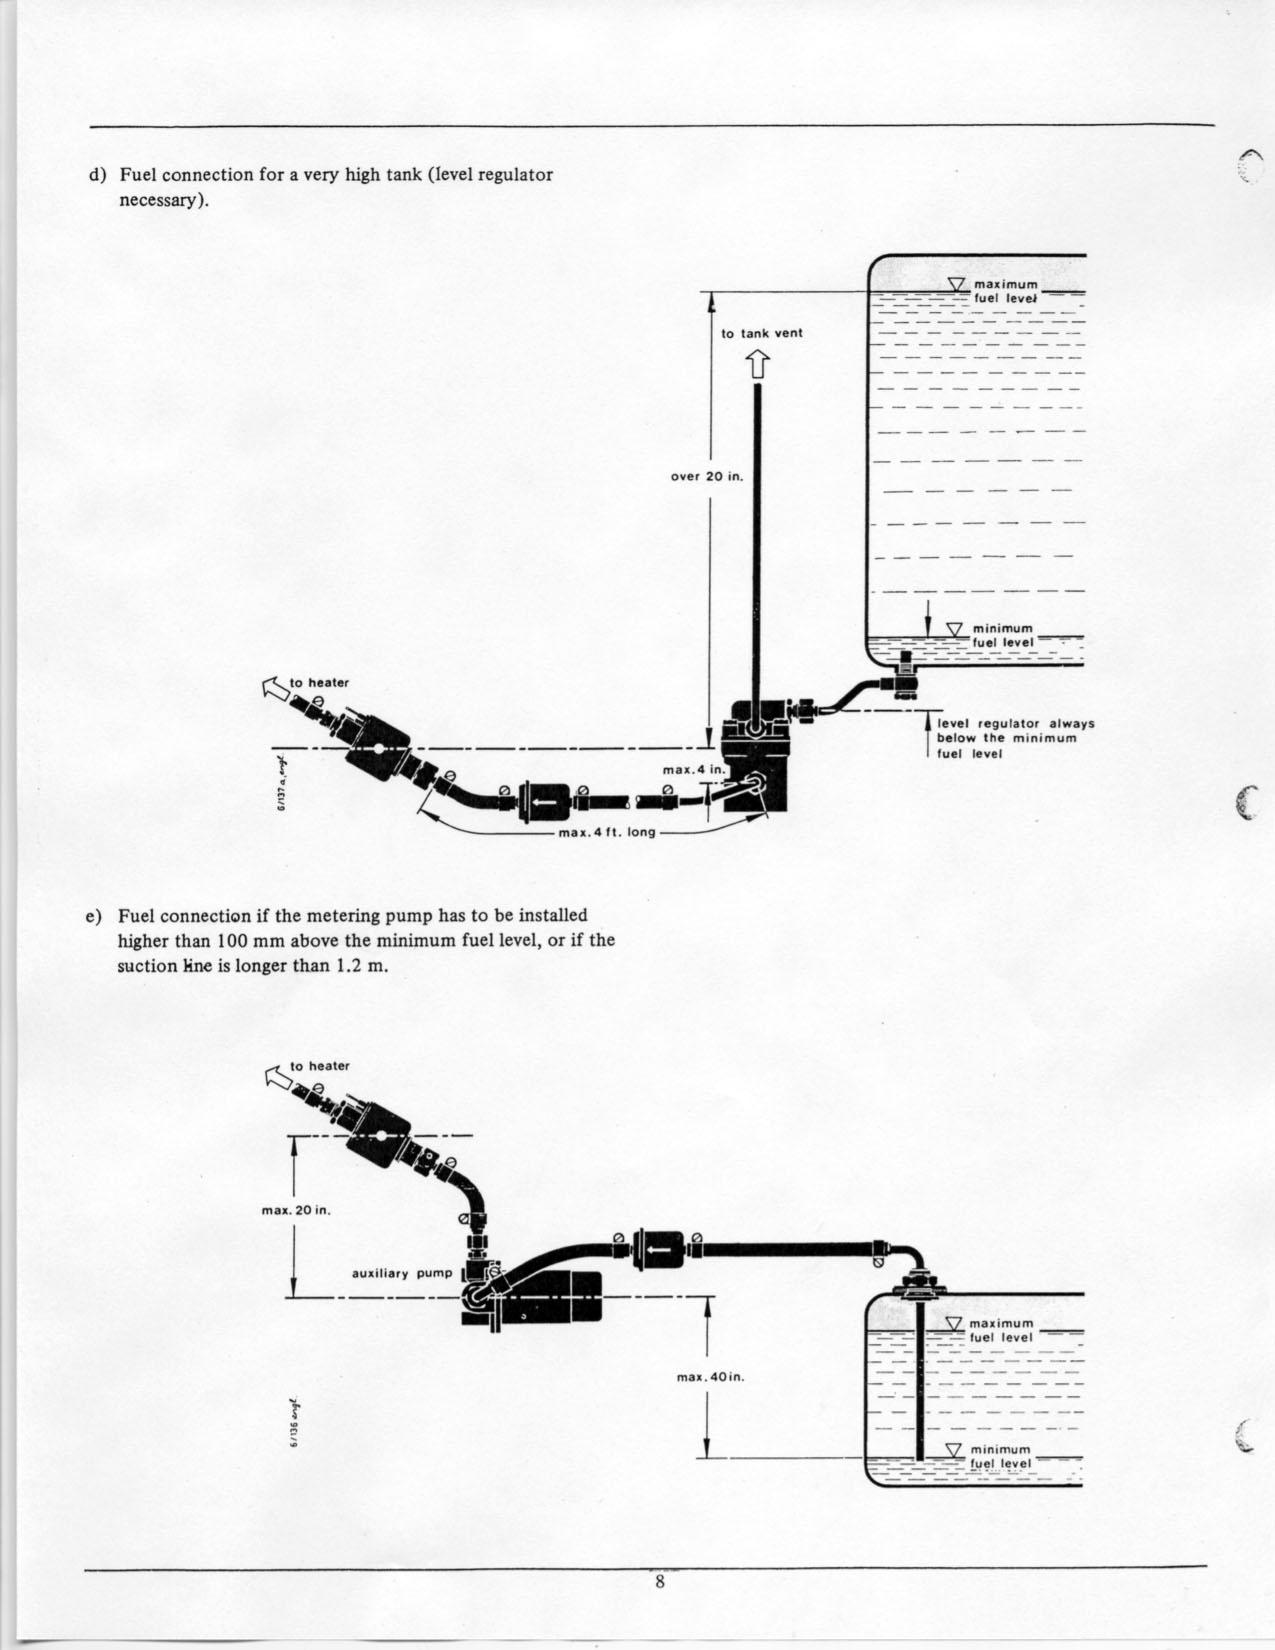 TheSamba.com :: 1973 Eberspacher BN 4 Technical